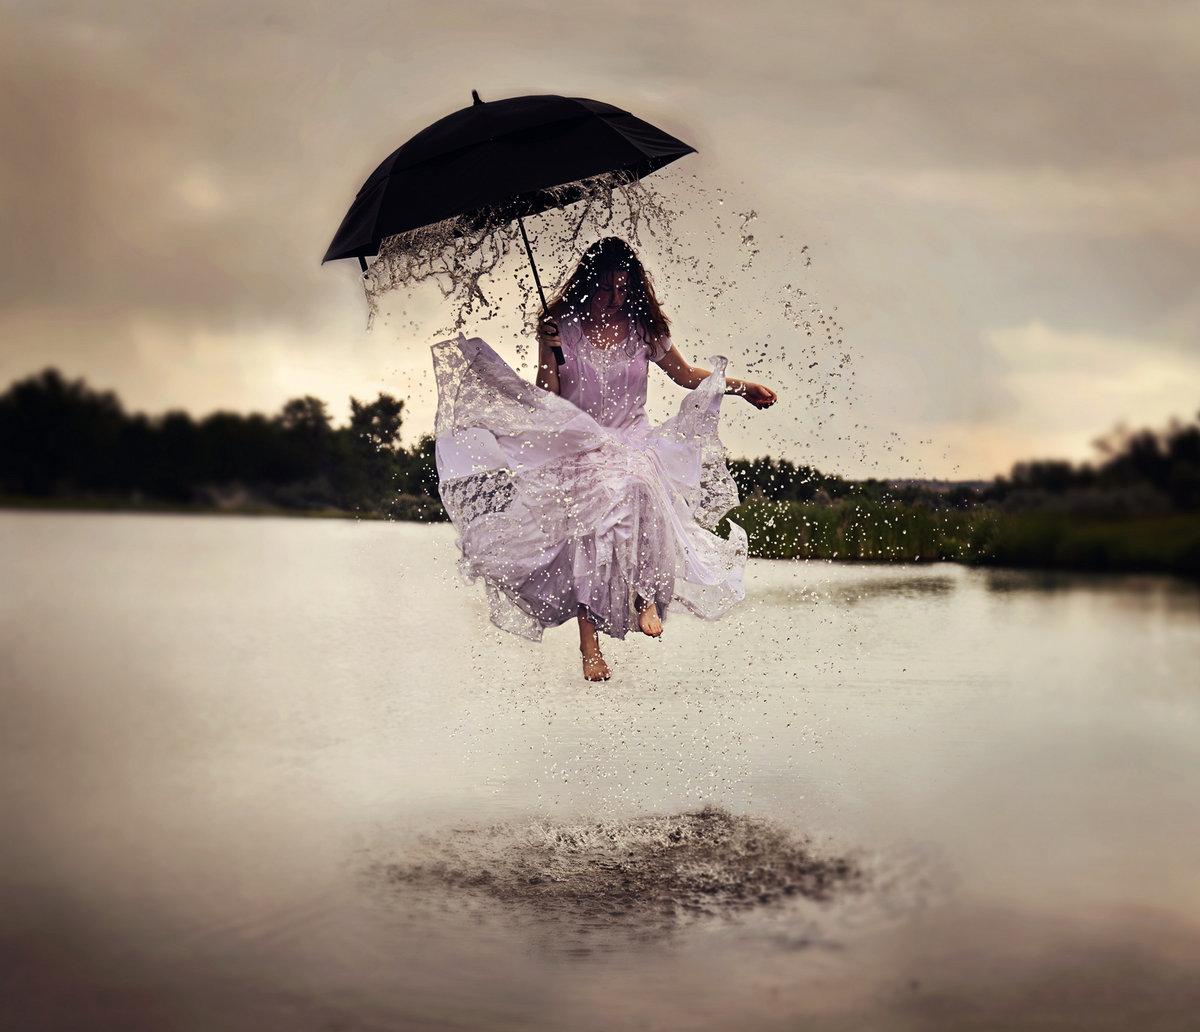 Surreal Rain | SÁNKET MÁHAPATRA